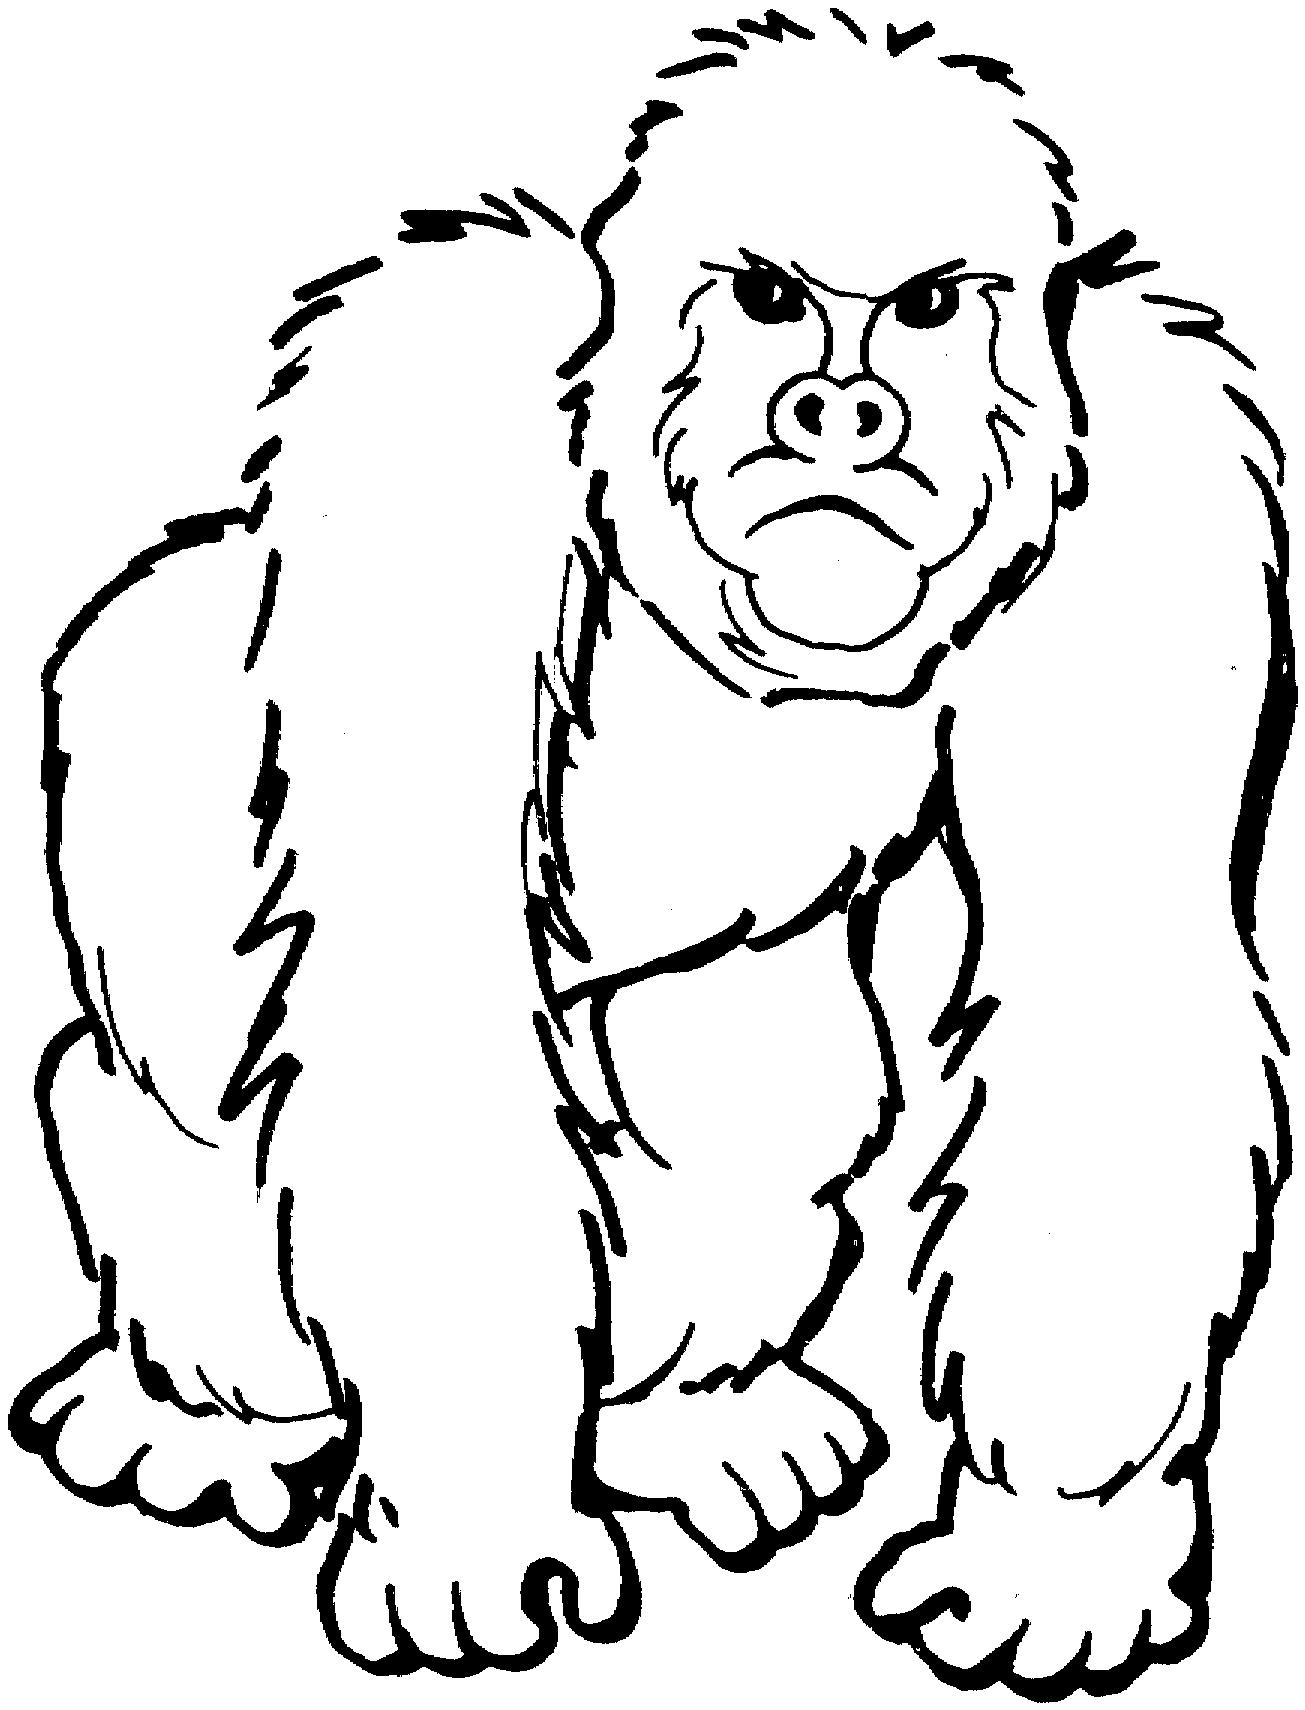 Ape clipart black and white, Ape black and white Transparent.